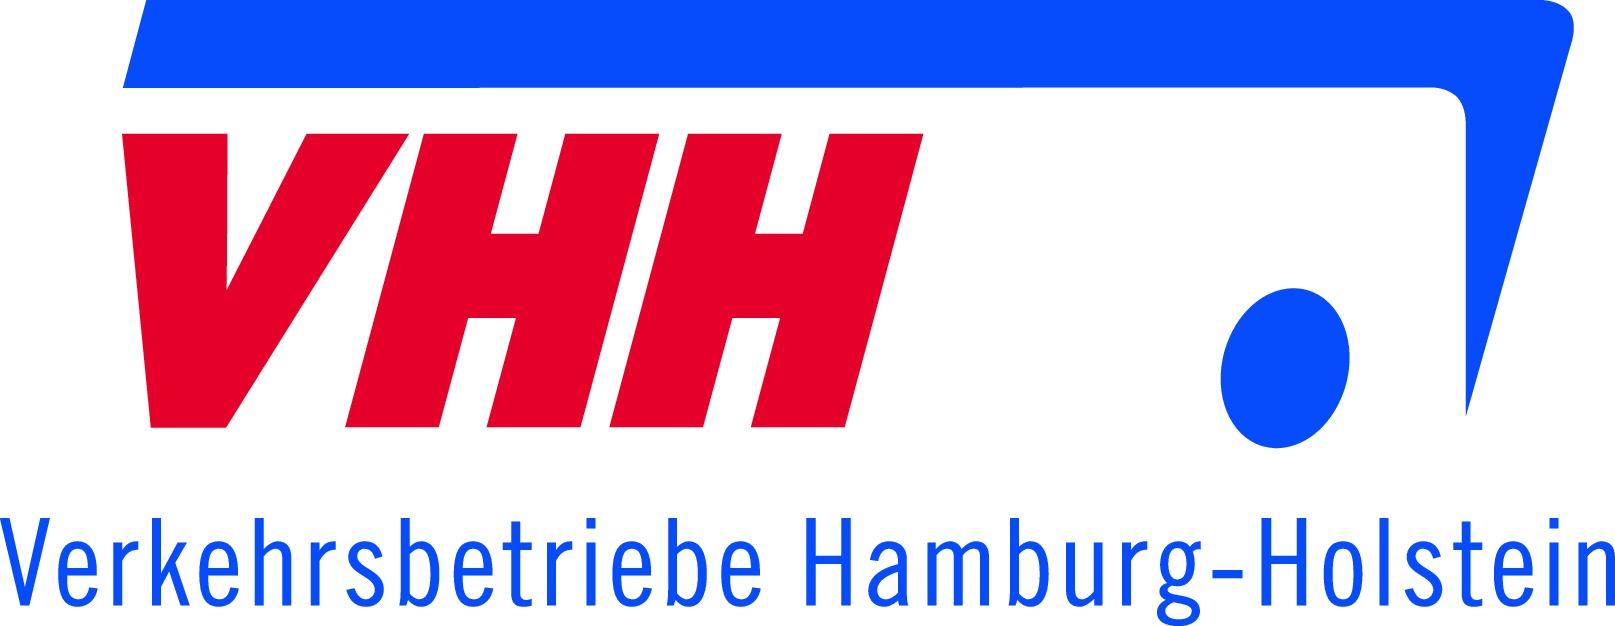 Verkehrsbetriebe Hamburg-Holstein GmbH